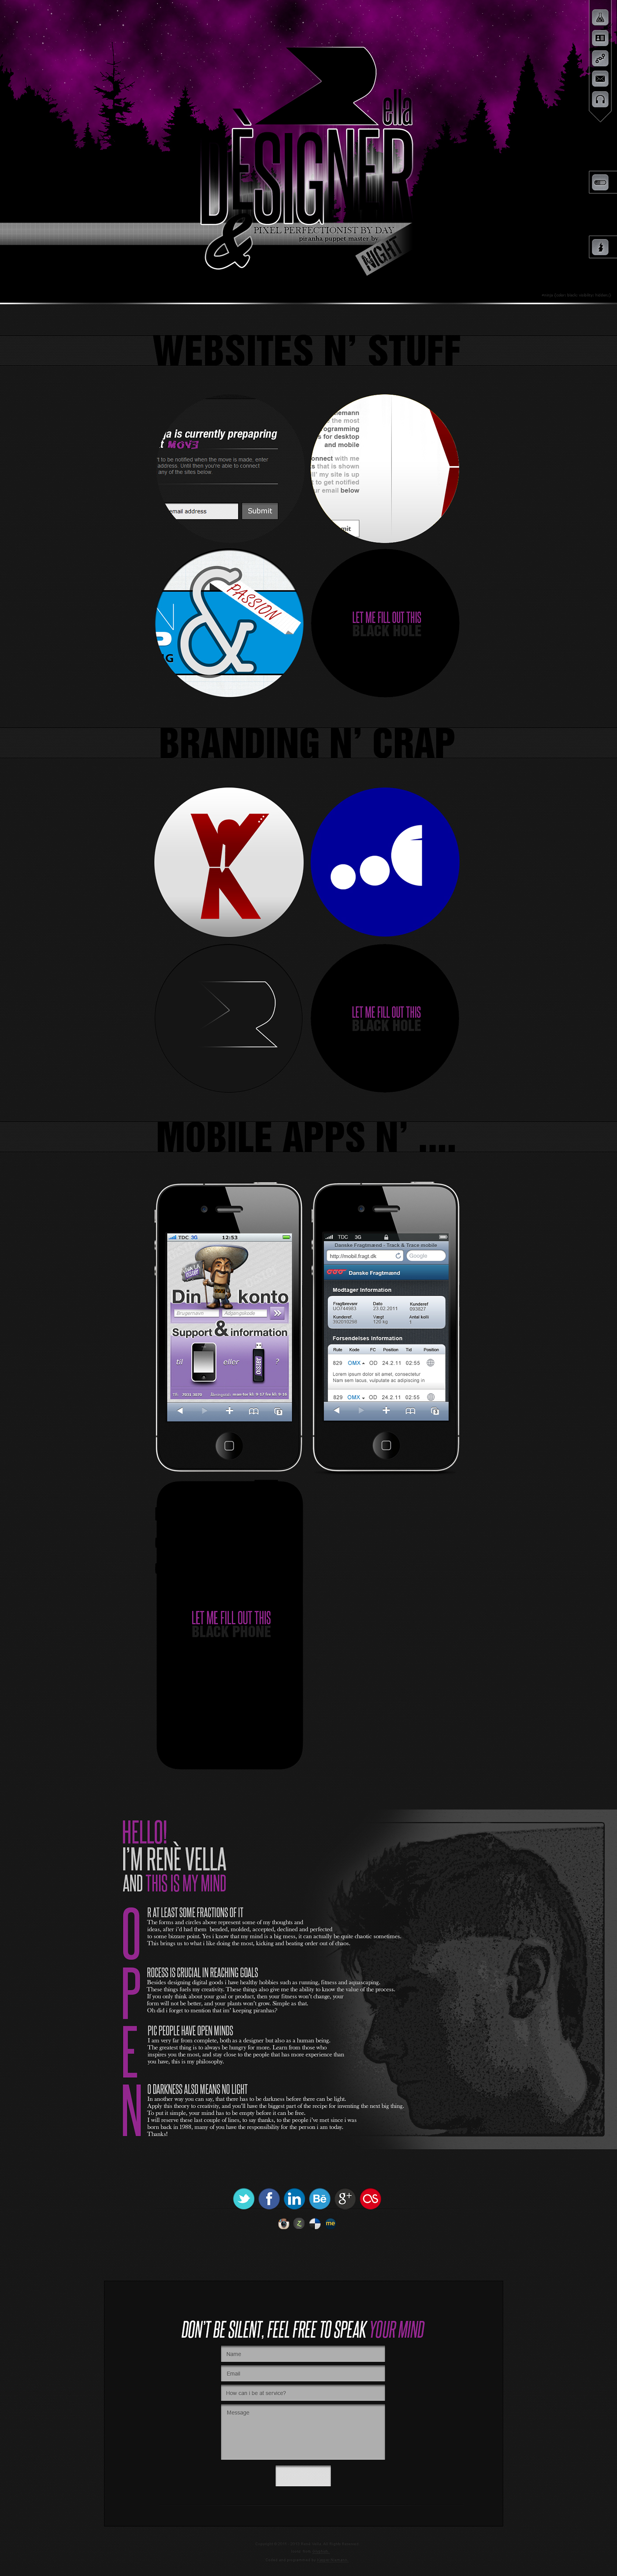 creative portfolio user experience Webdesign onpage ux UI digital